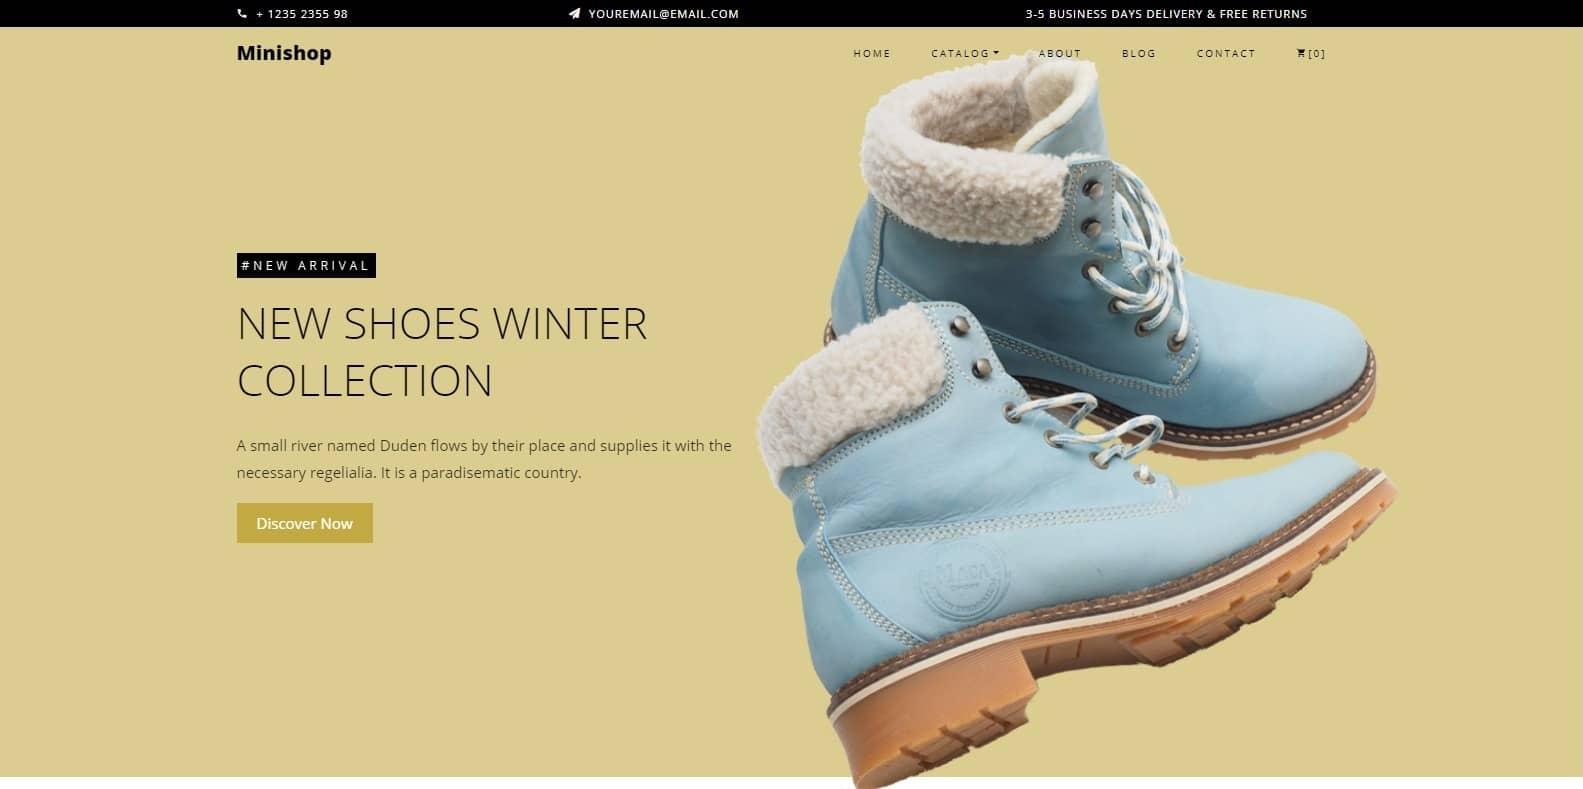 minishop-shop-website-template